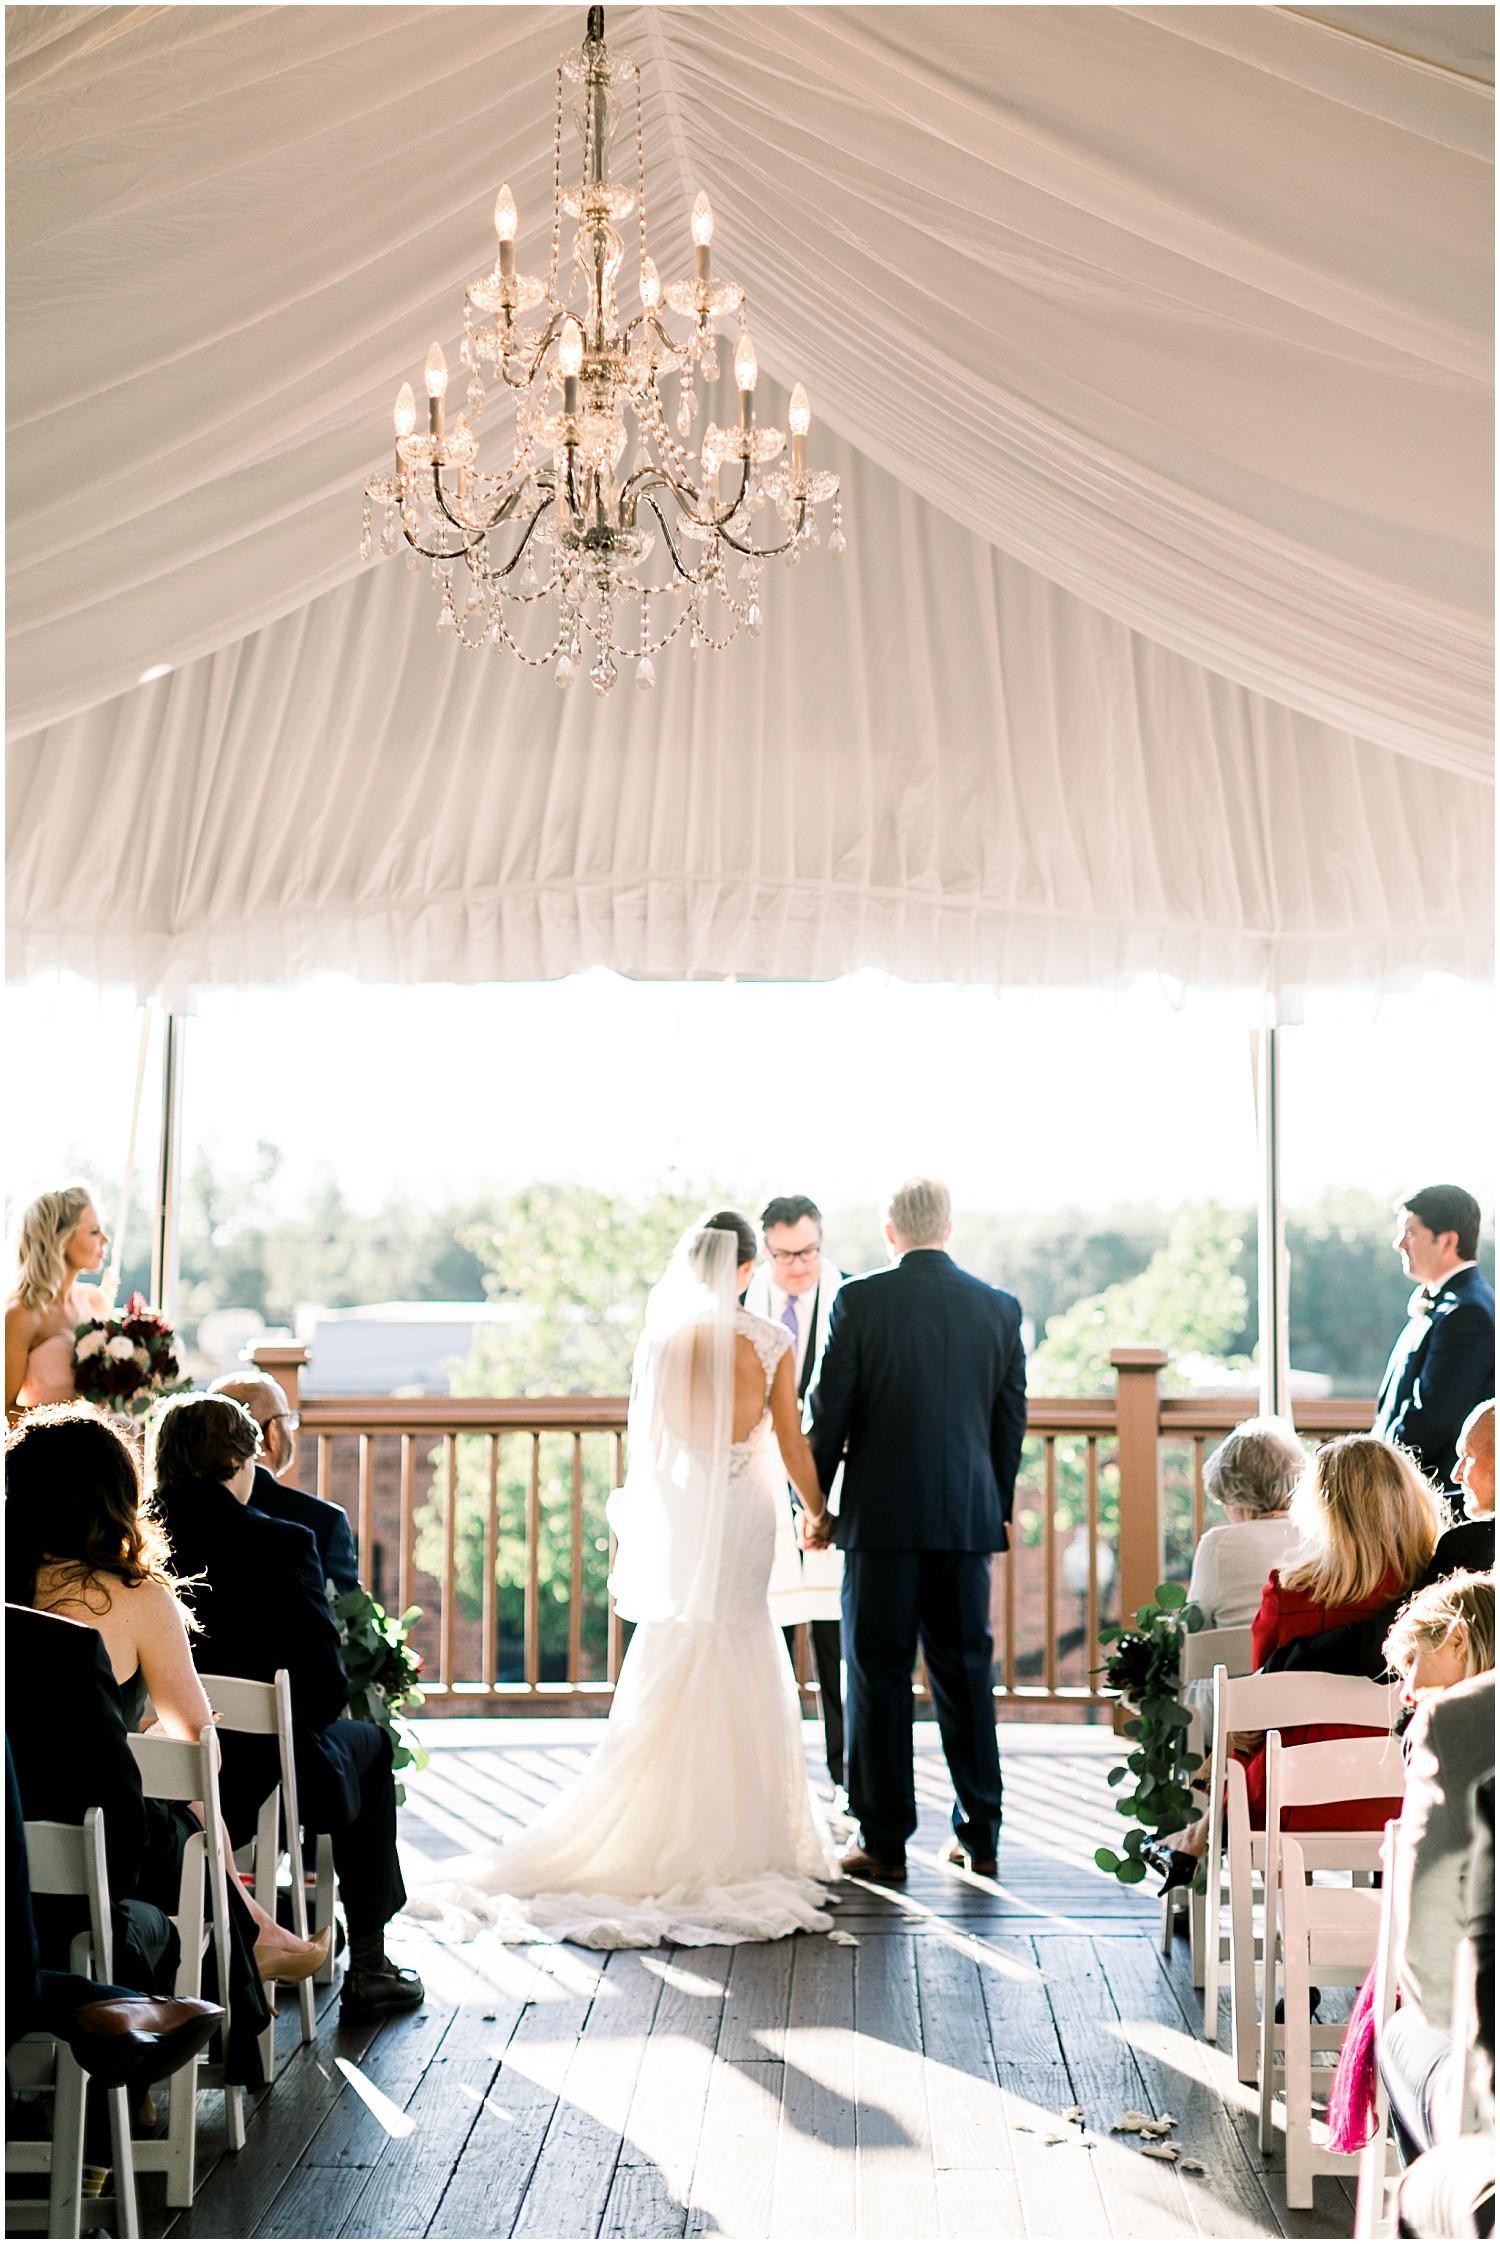 128 South Wedding venue, Downtown Wilmington NC Wedding_Erin L. Taylor Photography_0028.jpg